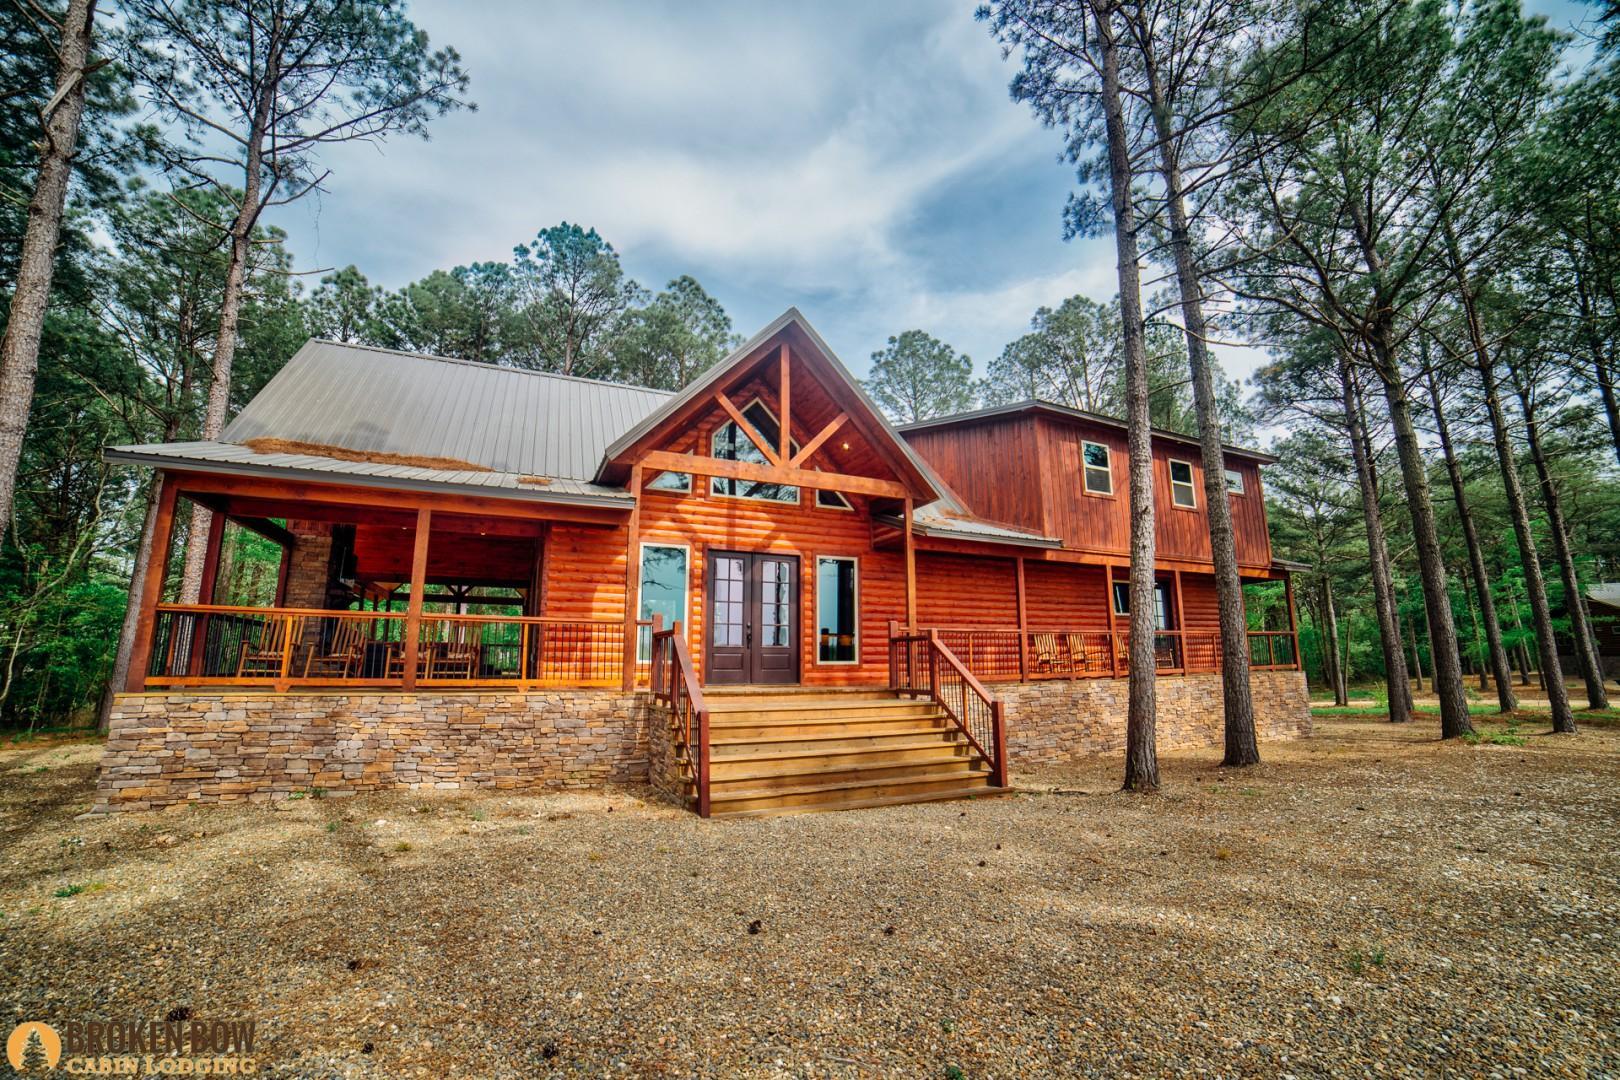 Lookout Ridge Lodge